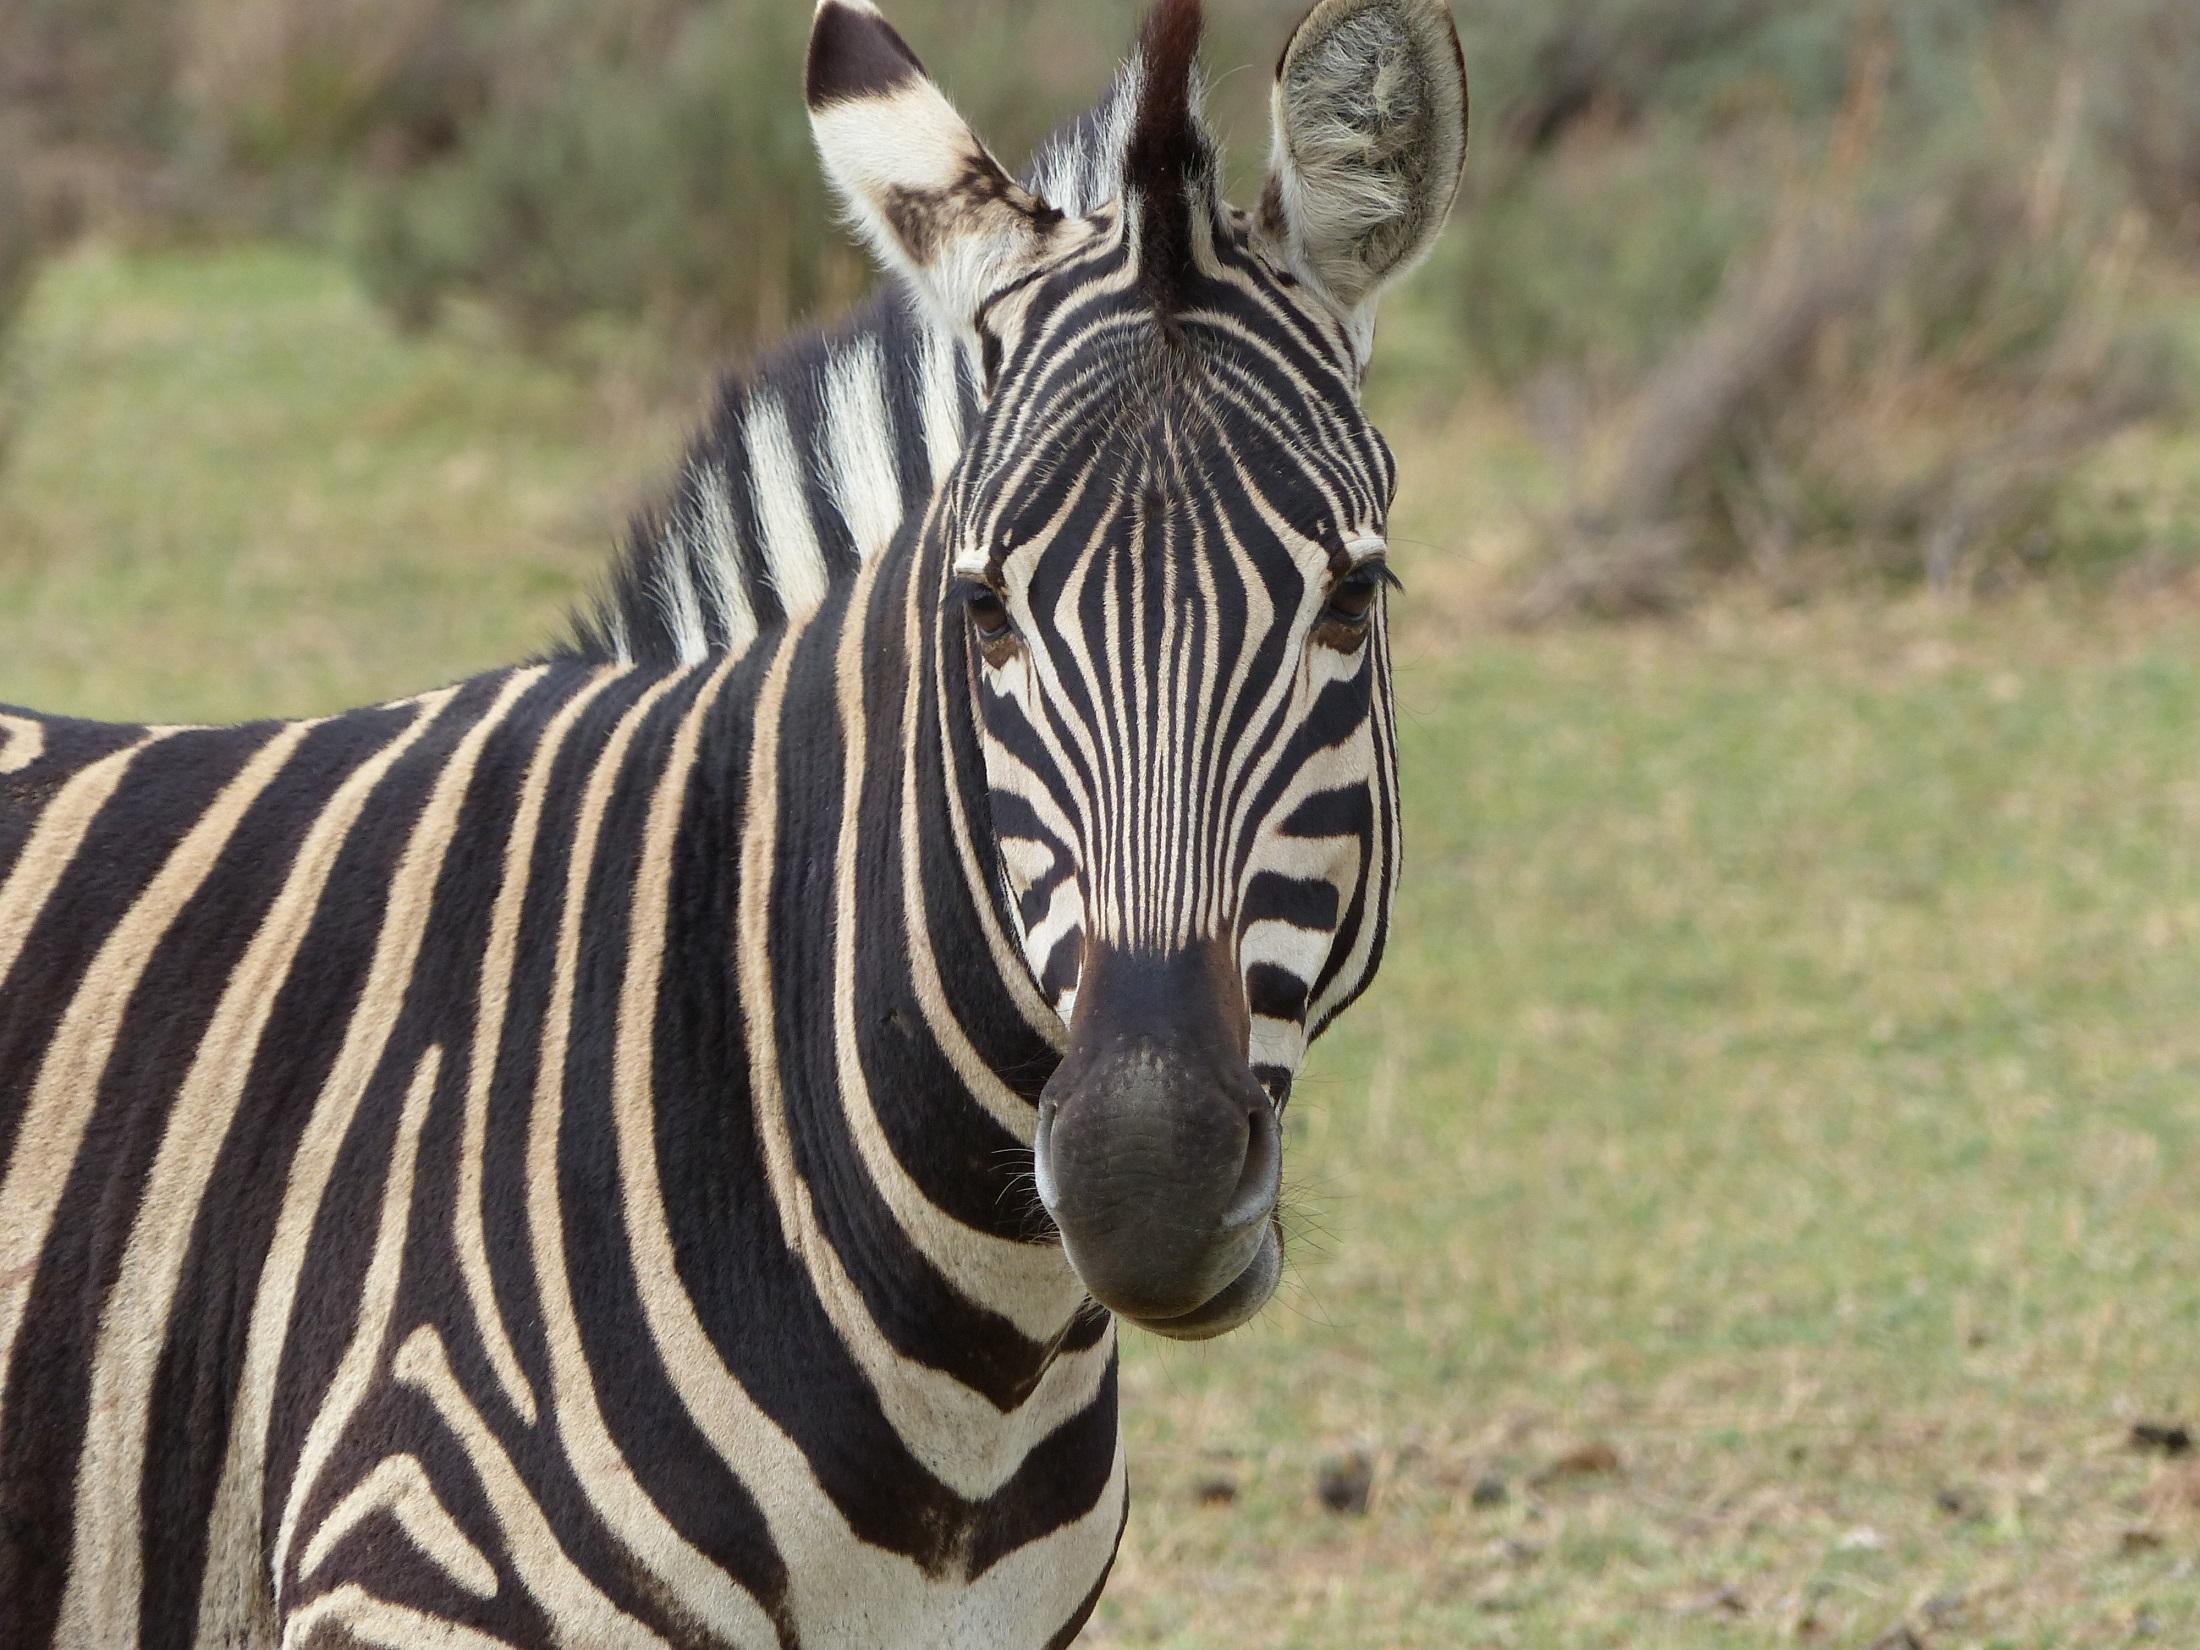 zebra animal looking head close wildlife standing portrait horse mammal daytime pexels striped fauna vertebrate safari outdoors nature pattern similar